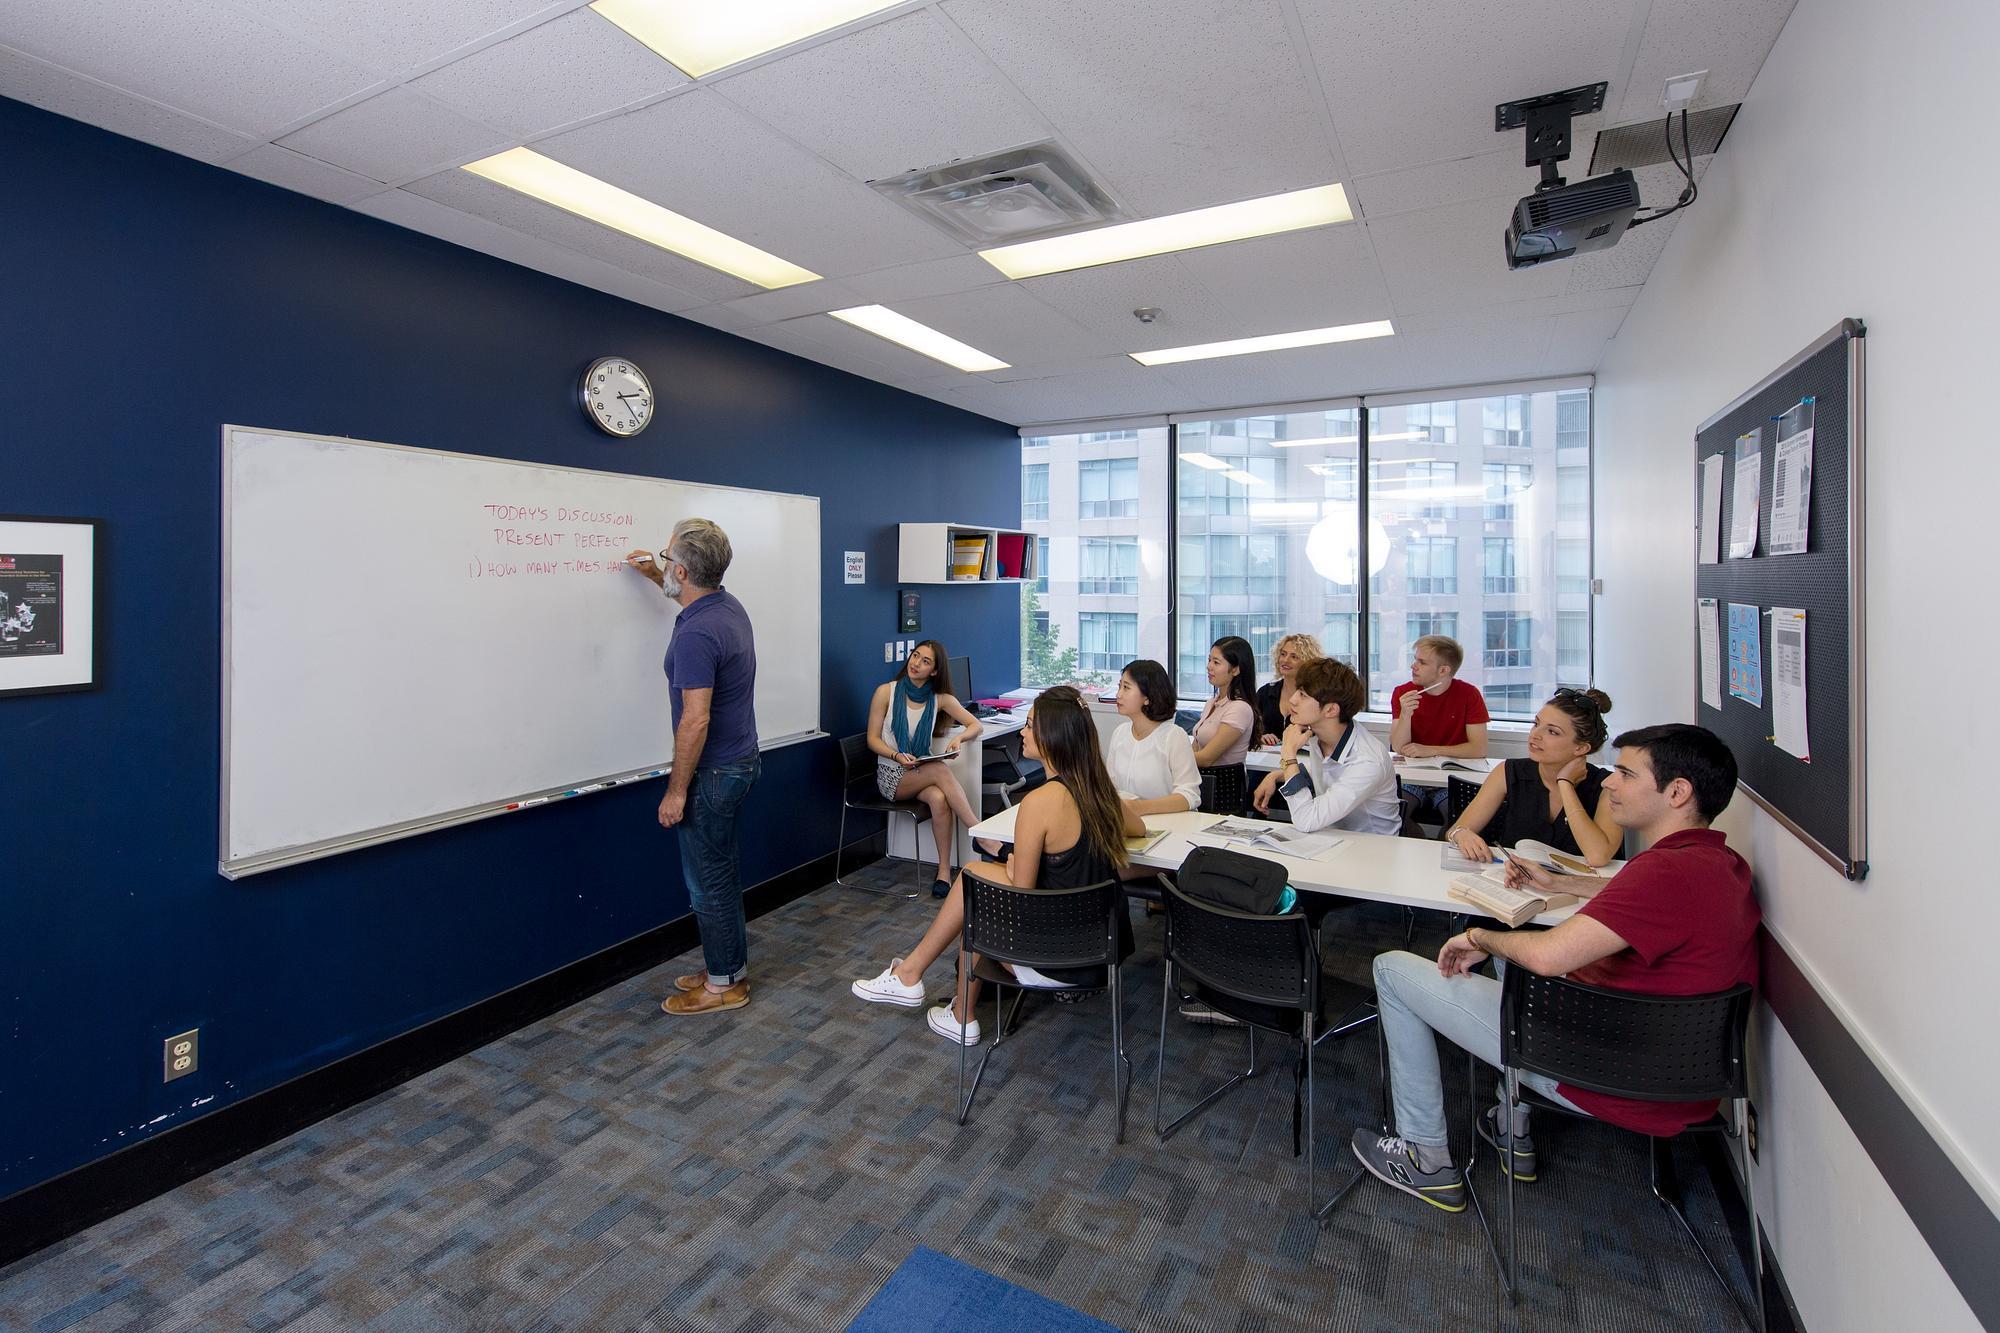 ILAC加拿大国际语言学院在线英语培训课程 我在ILAC7个月的真实学习体验 87